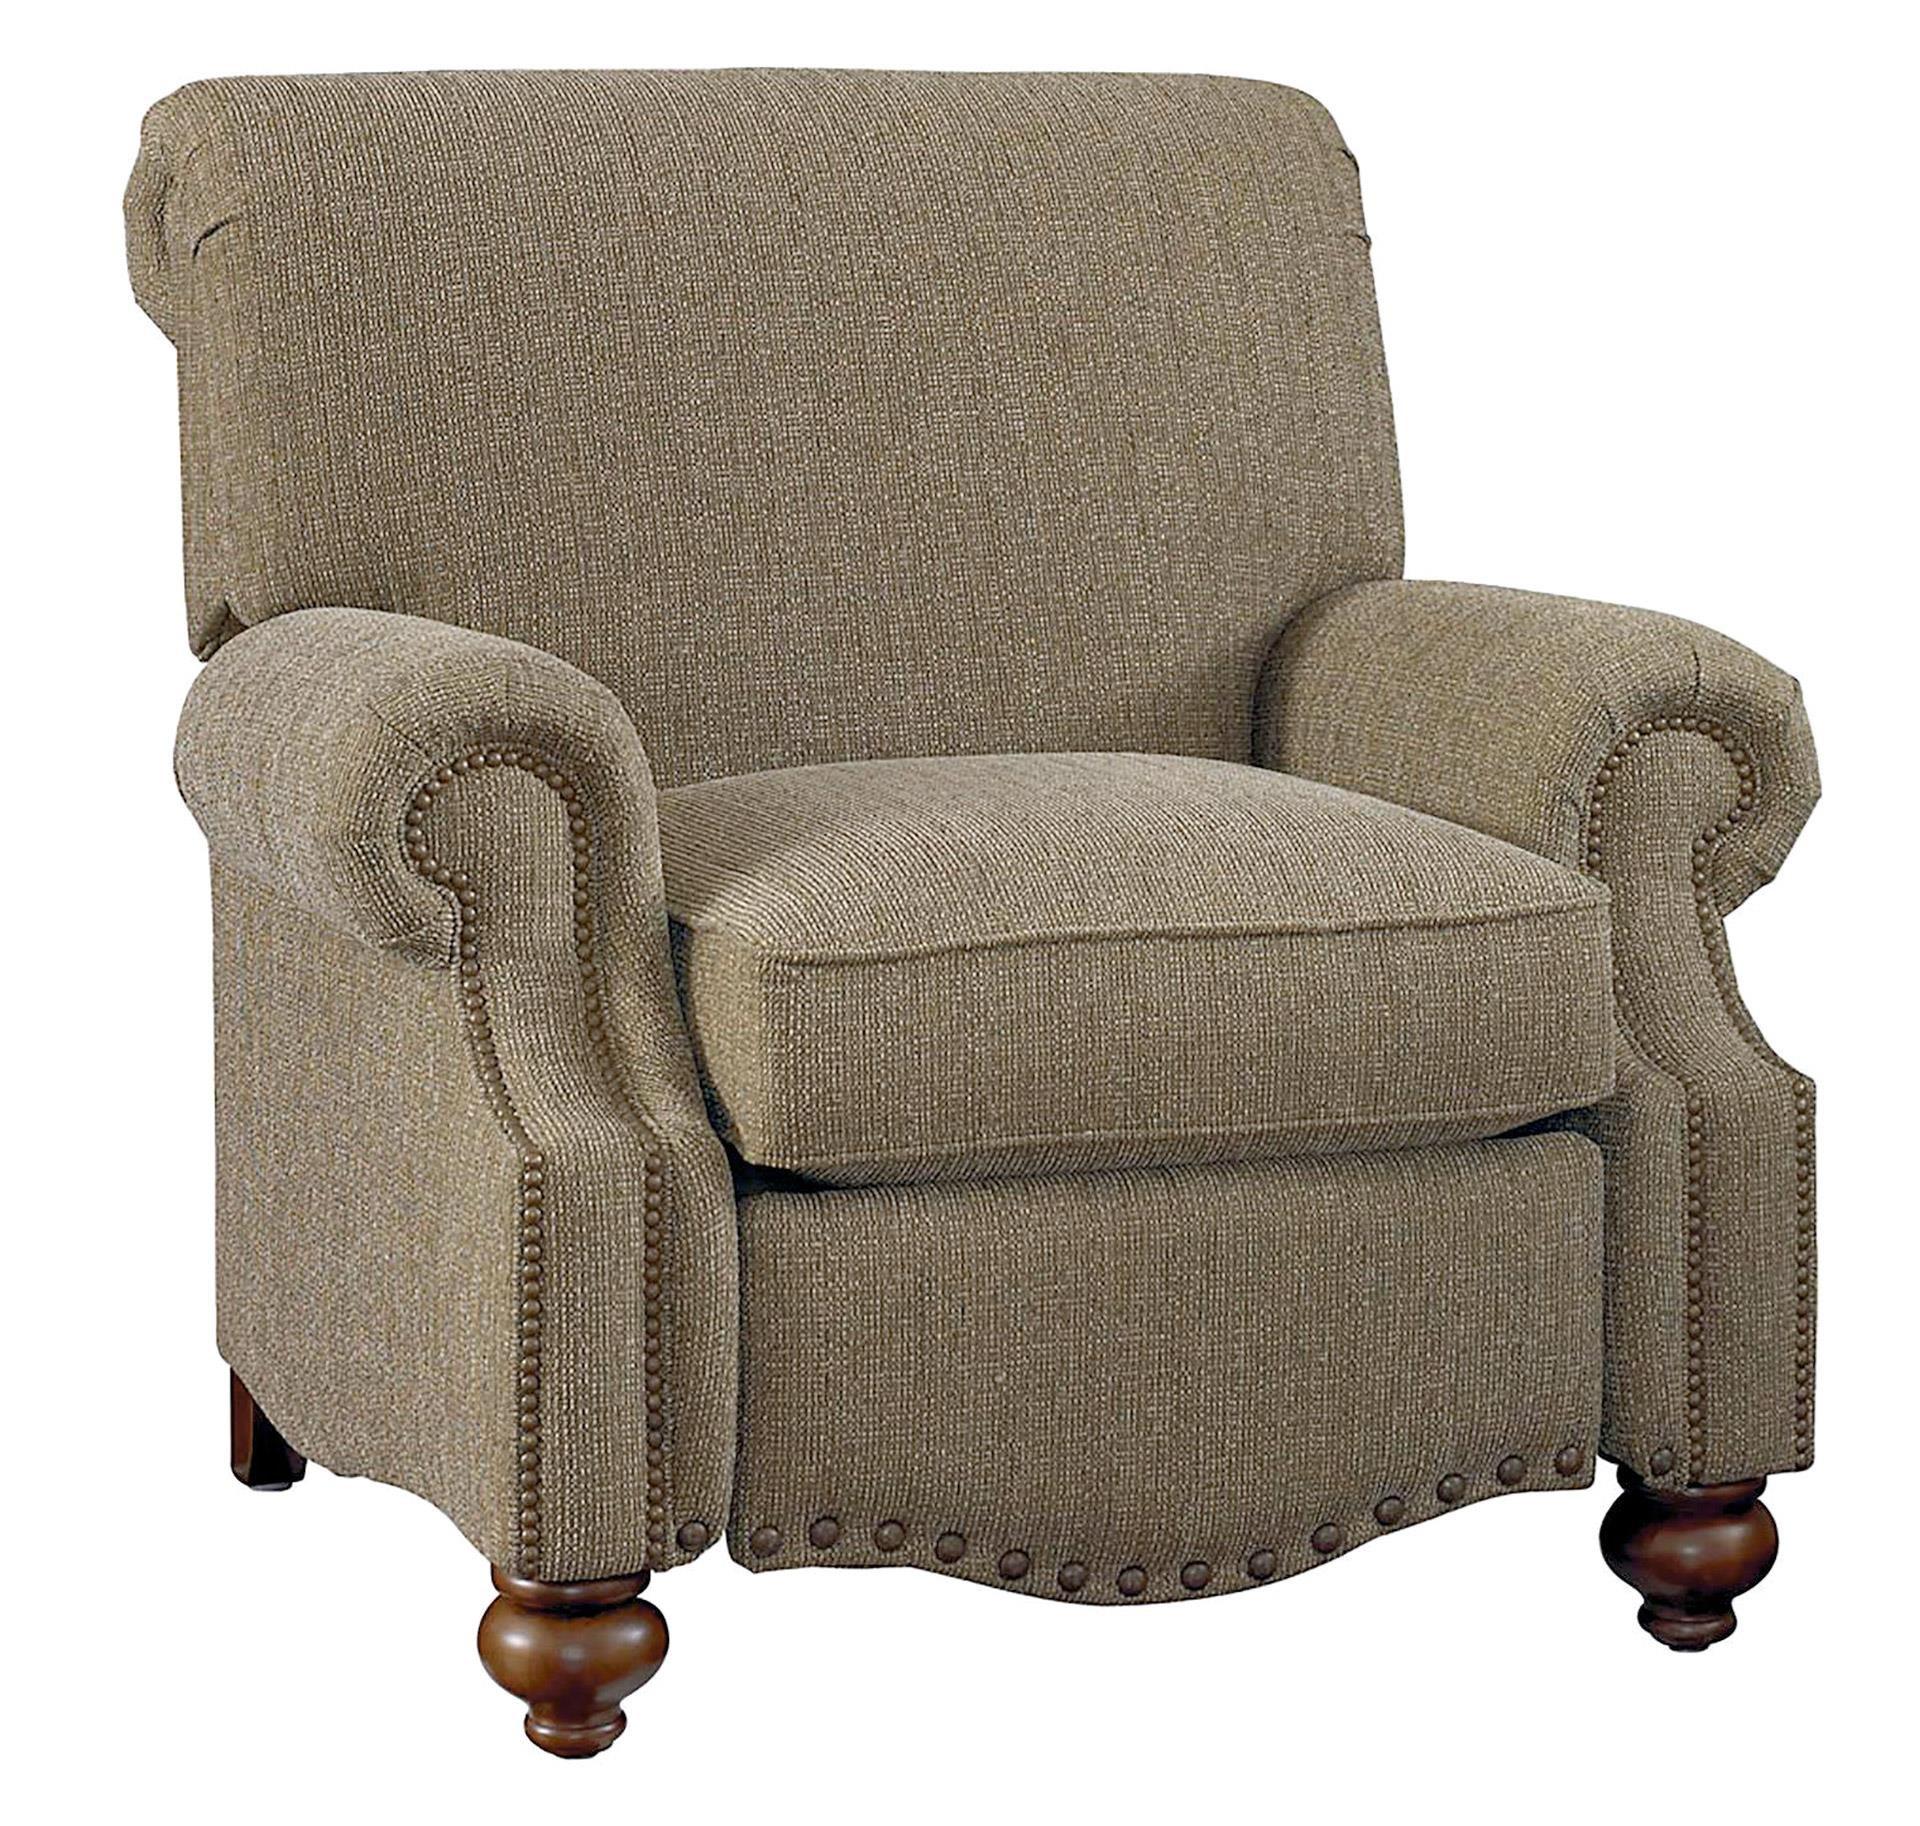 Bassett Club Room Chair - Item Number: 3991-12FC 1474-8